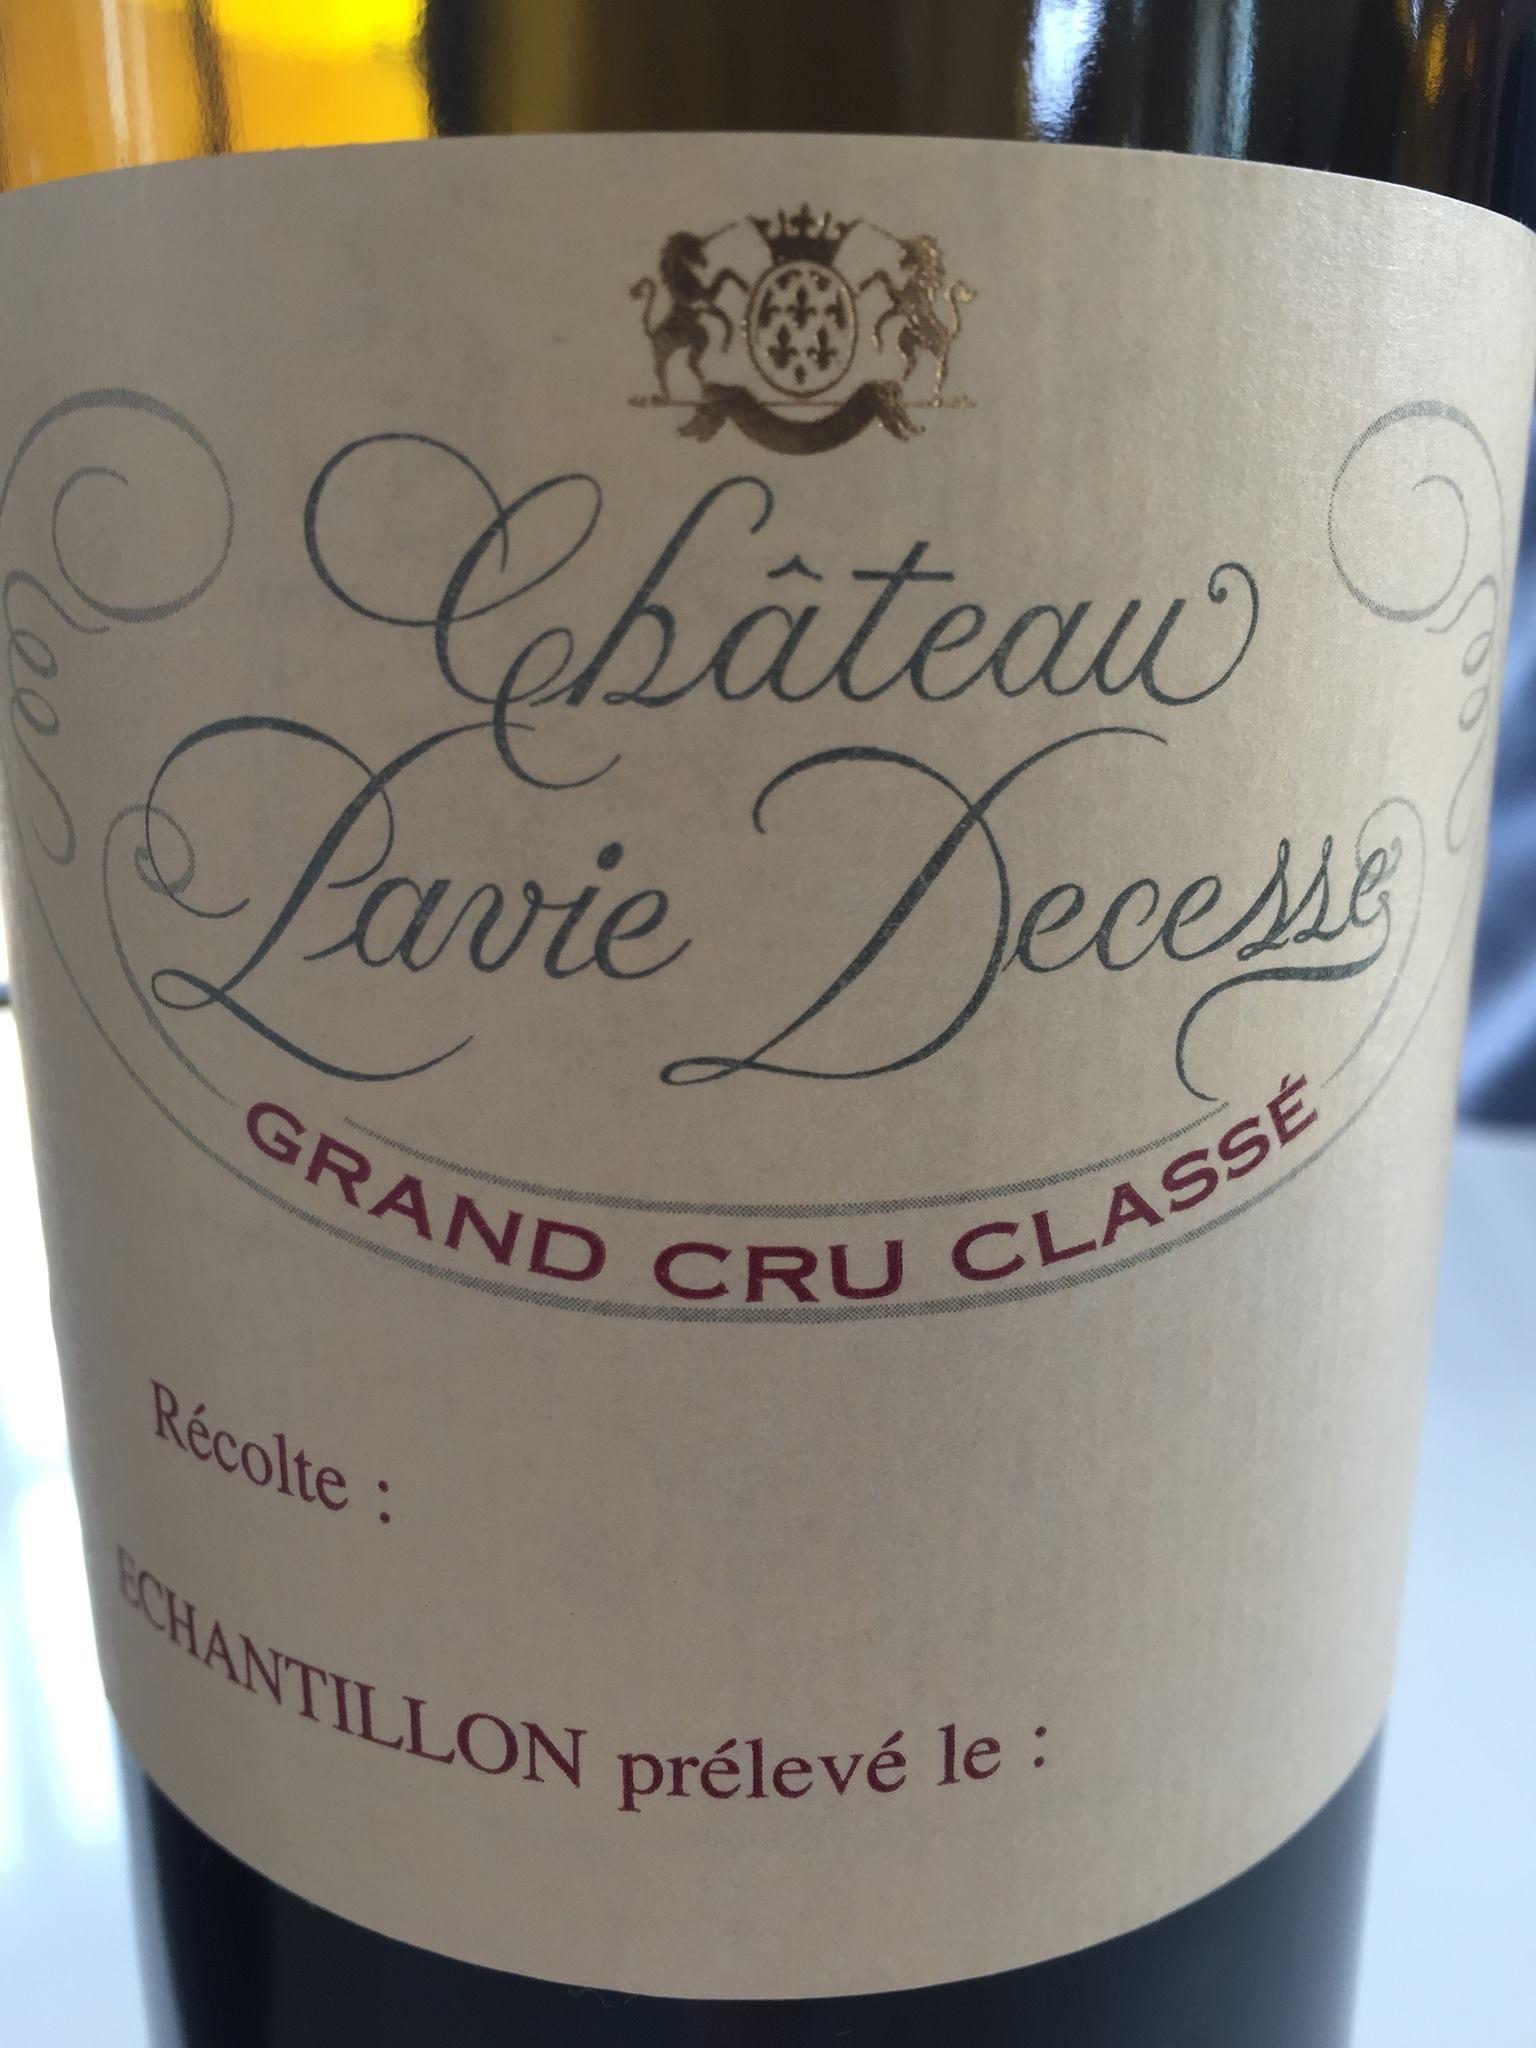 Château Pavie-Decesse 2015 – Saint-Emilion Grand Cru Classé